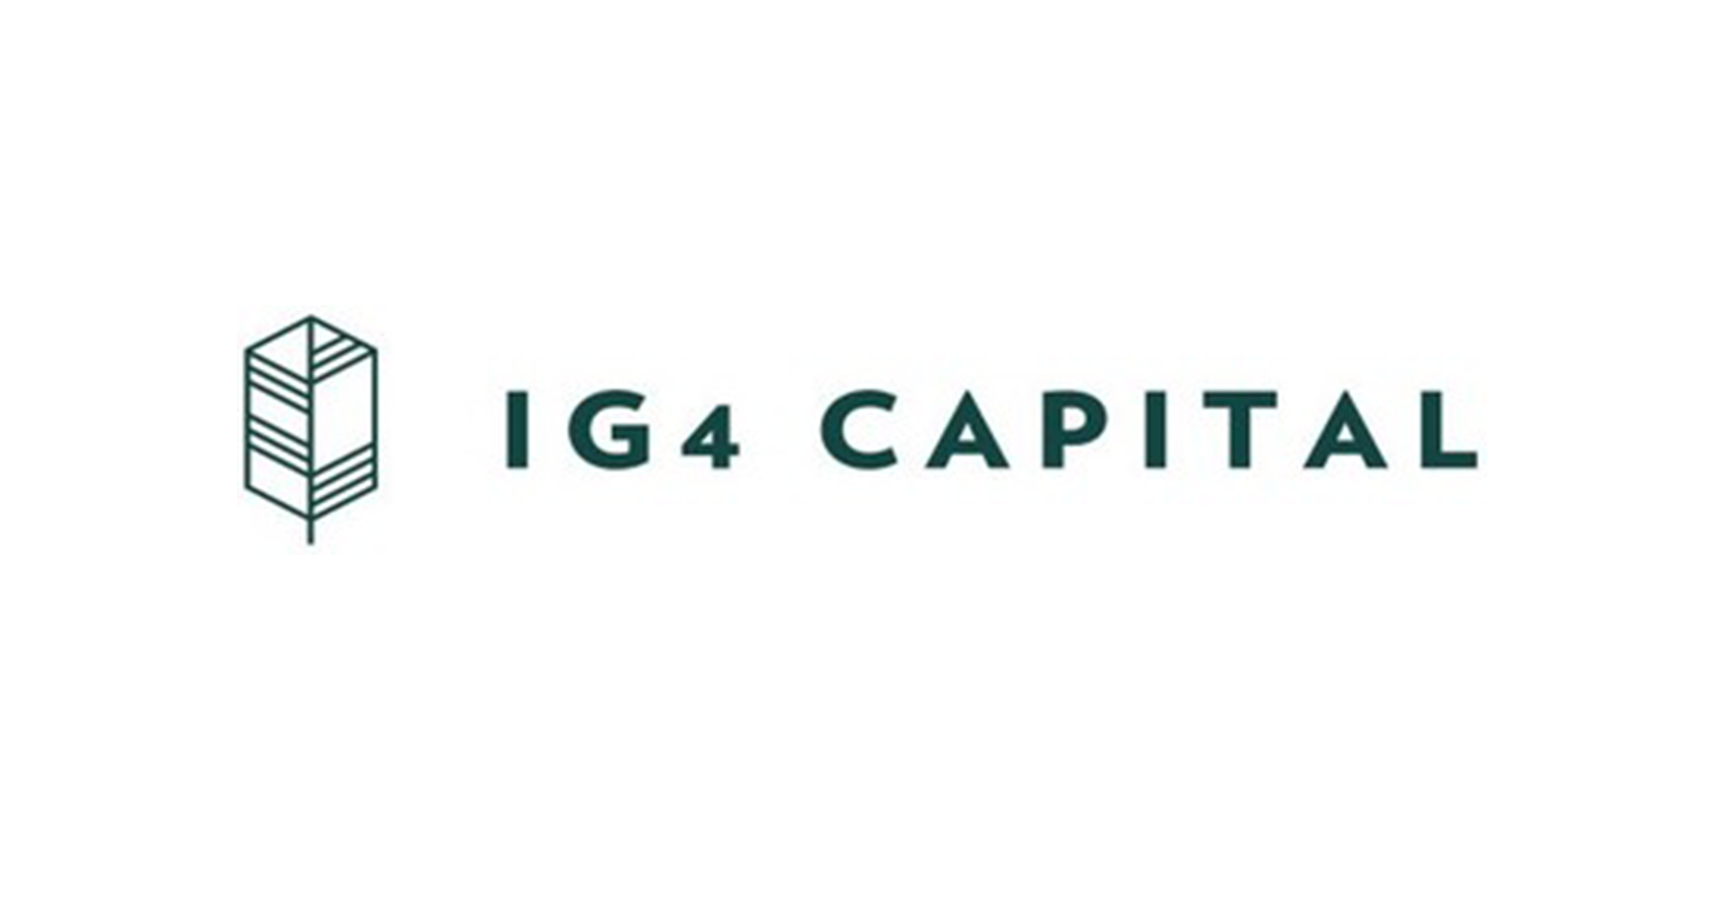 IG4 Capital